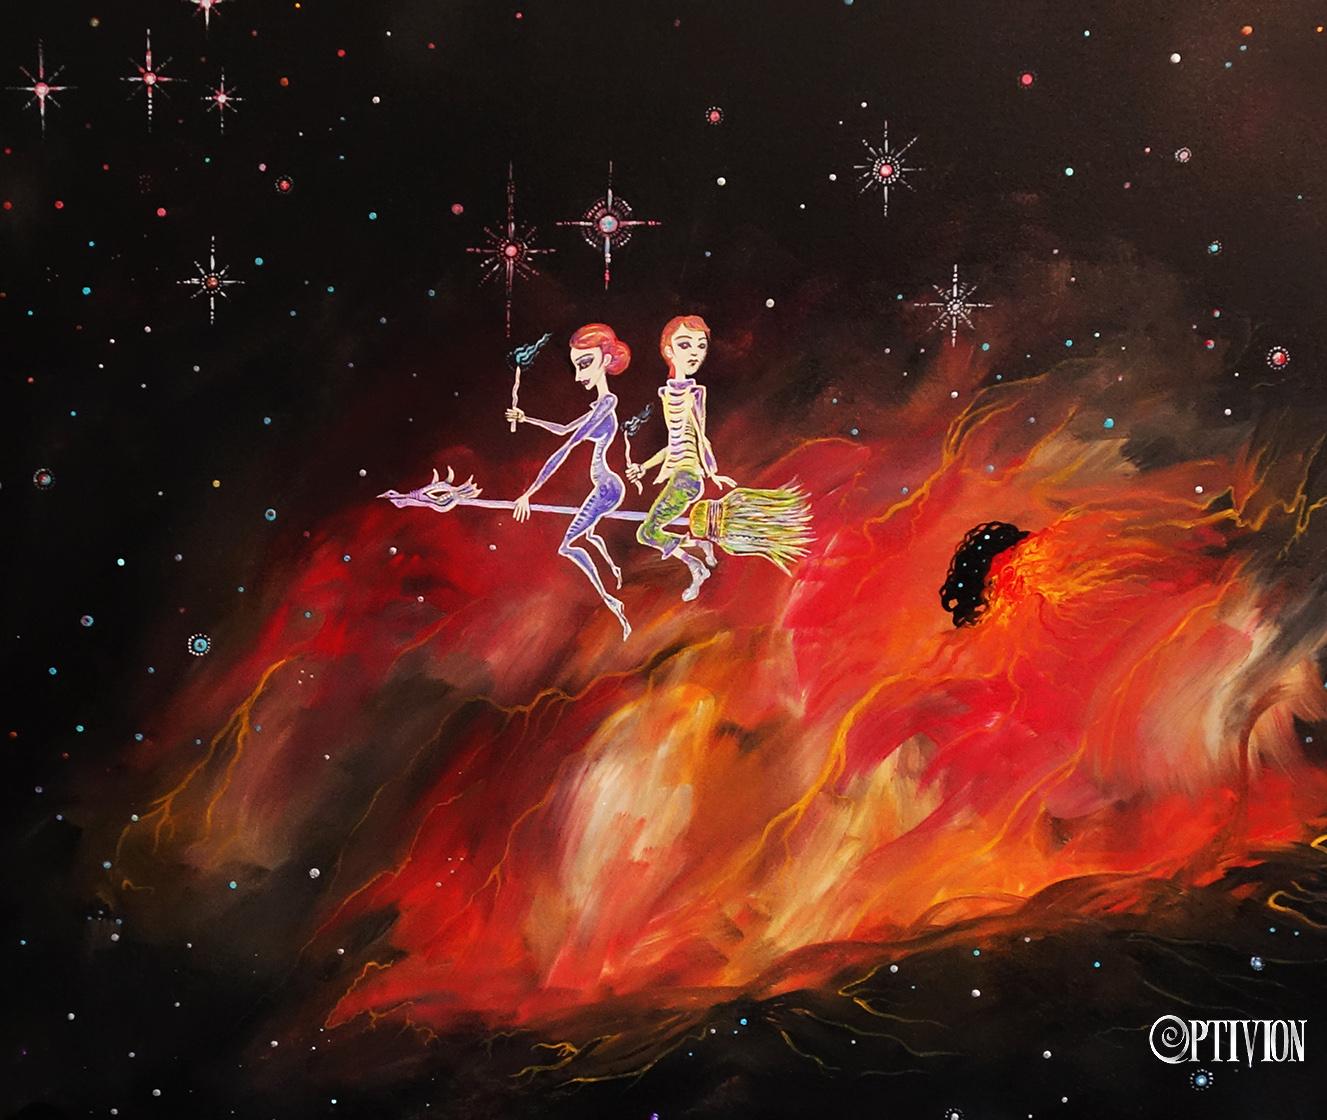 Bonding Through The Nebula by OptivioN